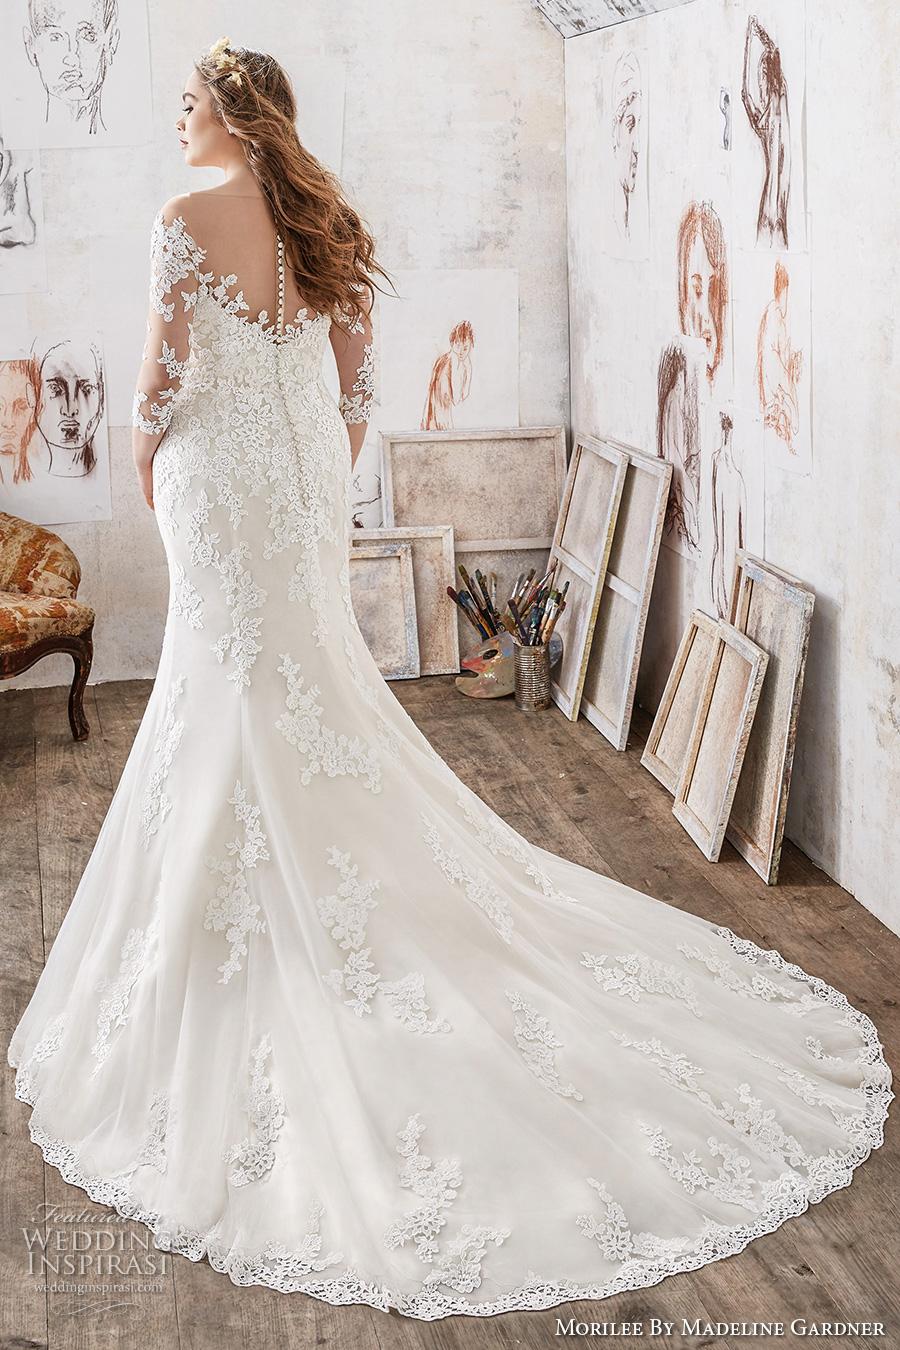 Plus Size Mermaid Wedding Dress 25 Trend morilee julietta spring bridal